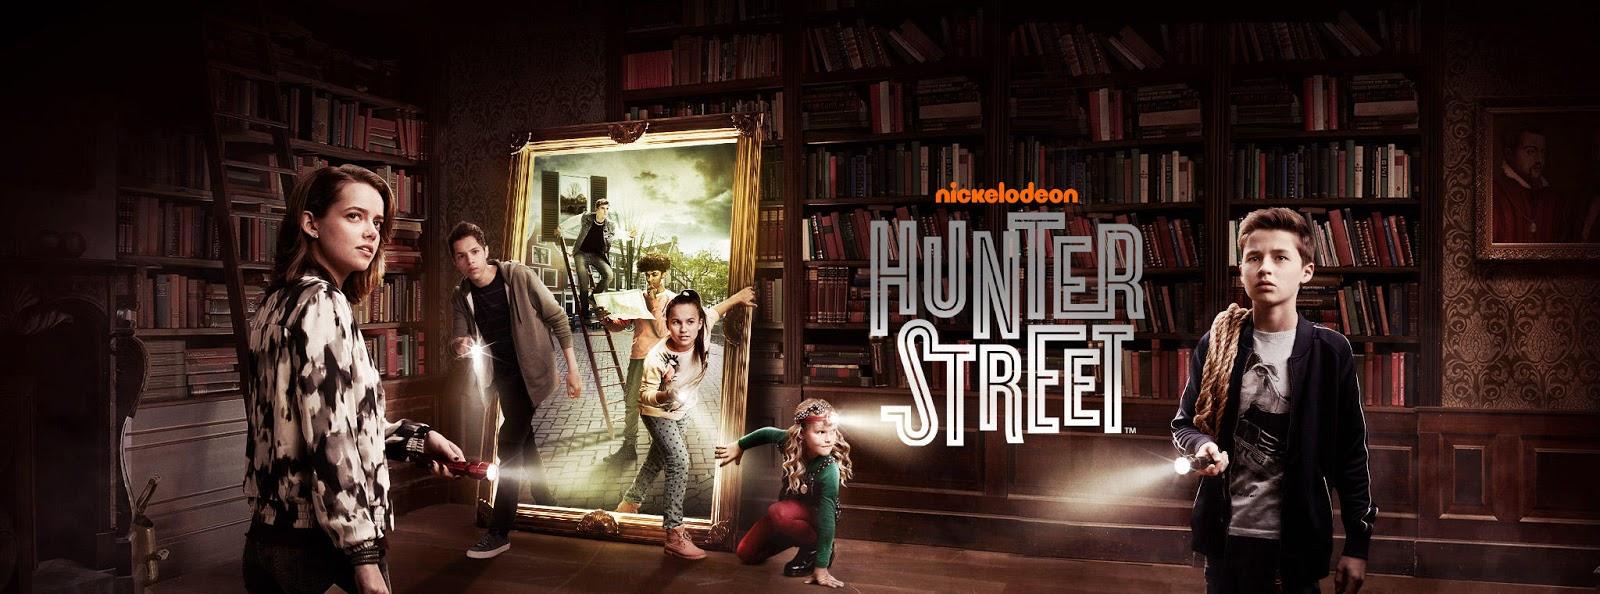 Hunter dude scene two